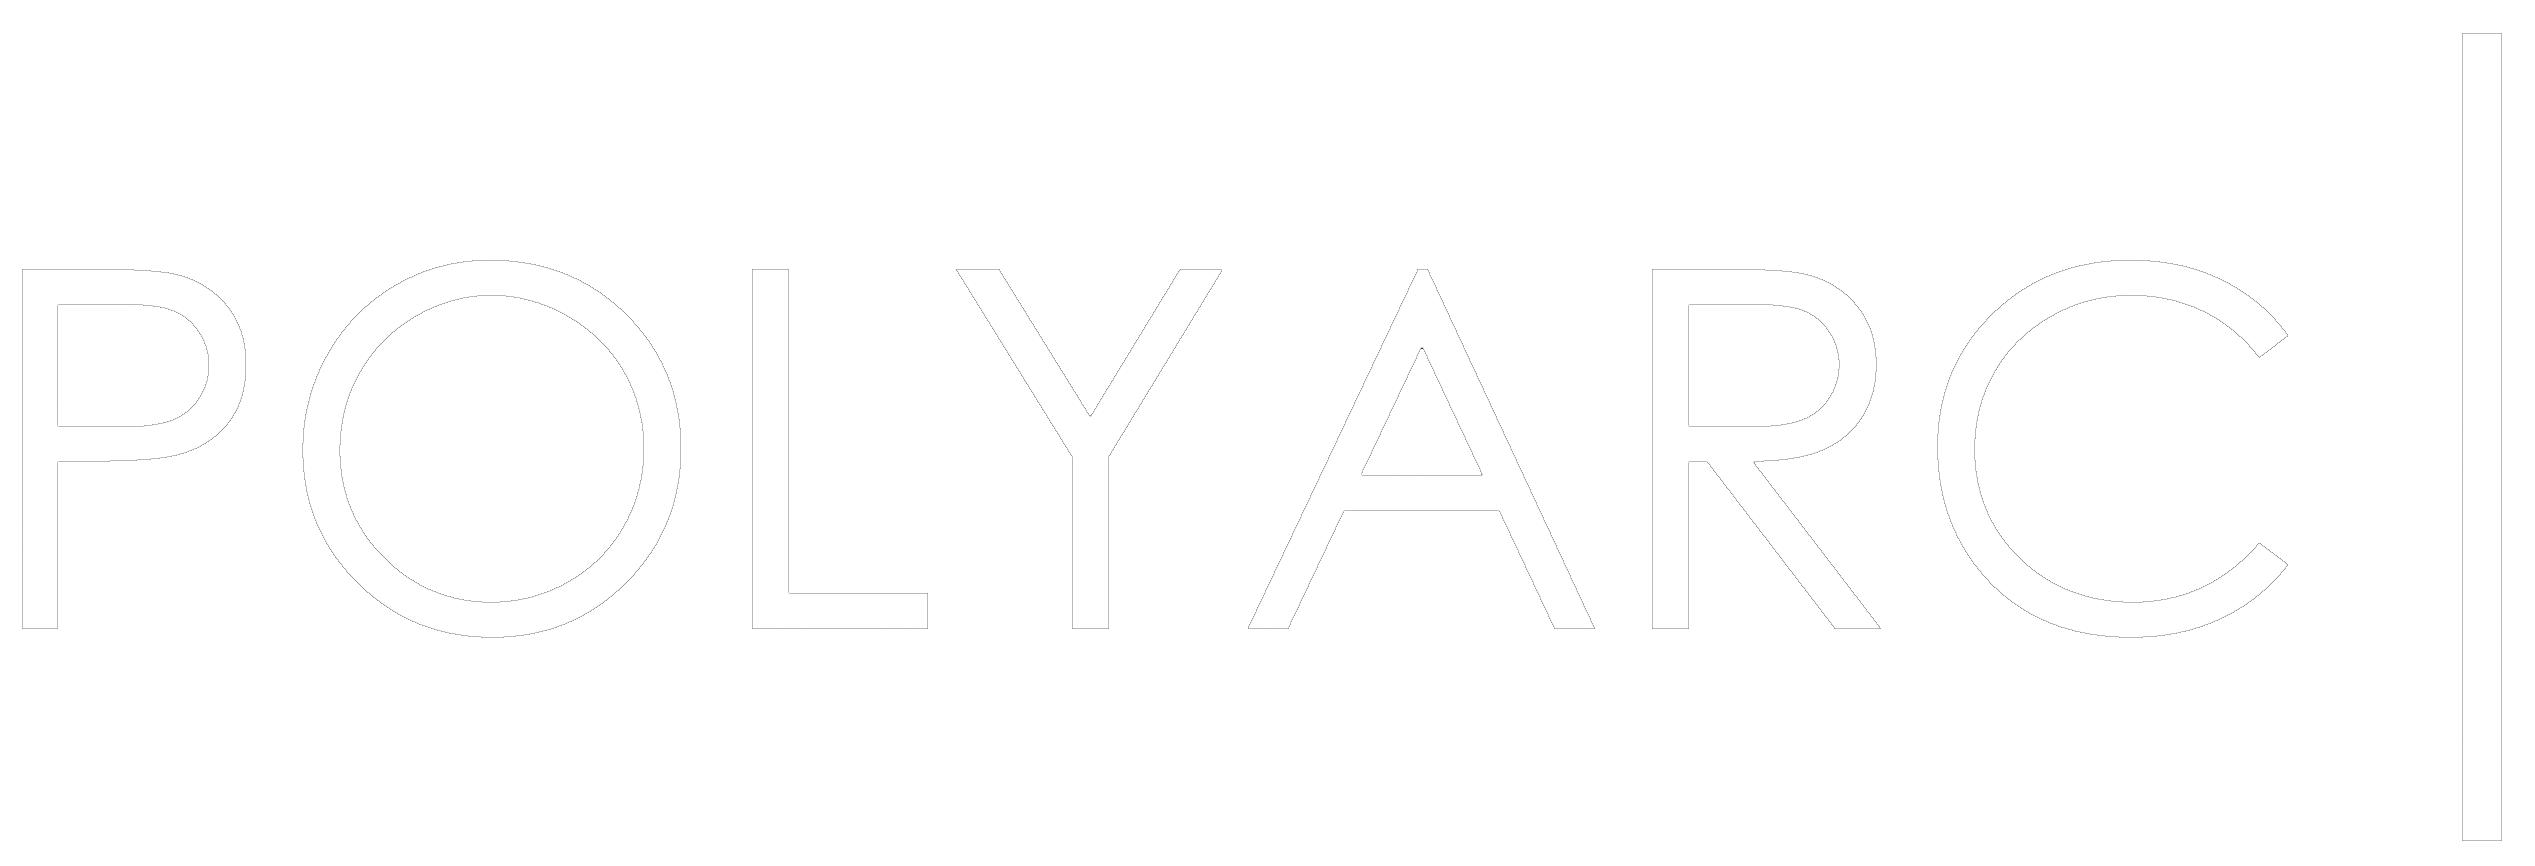 Polyarc